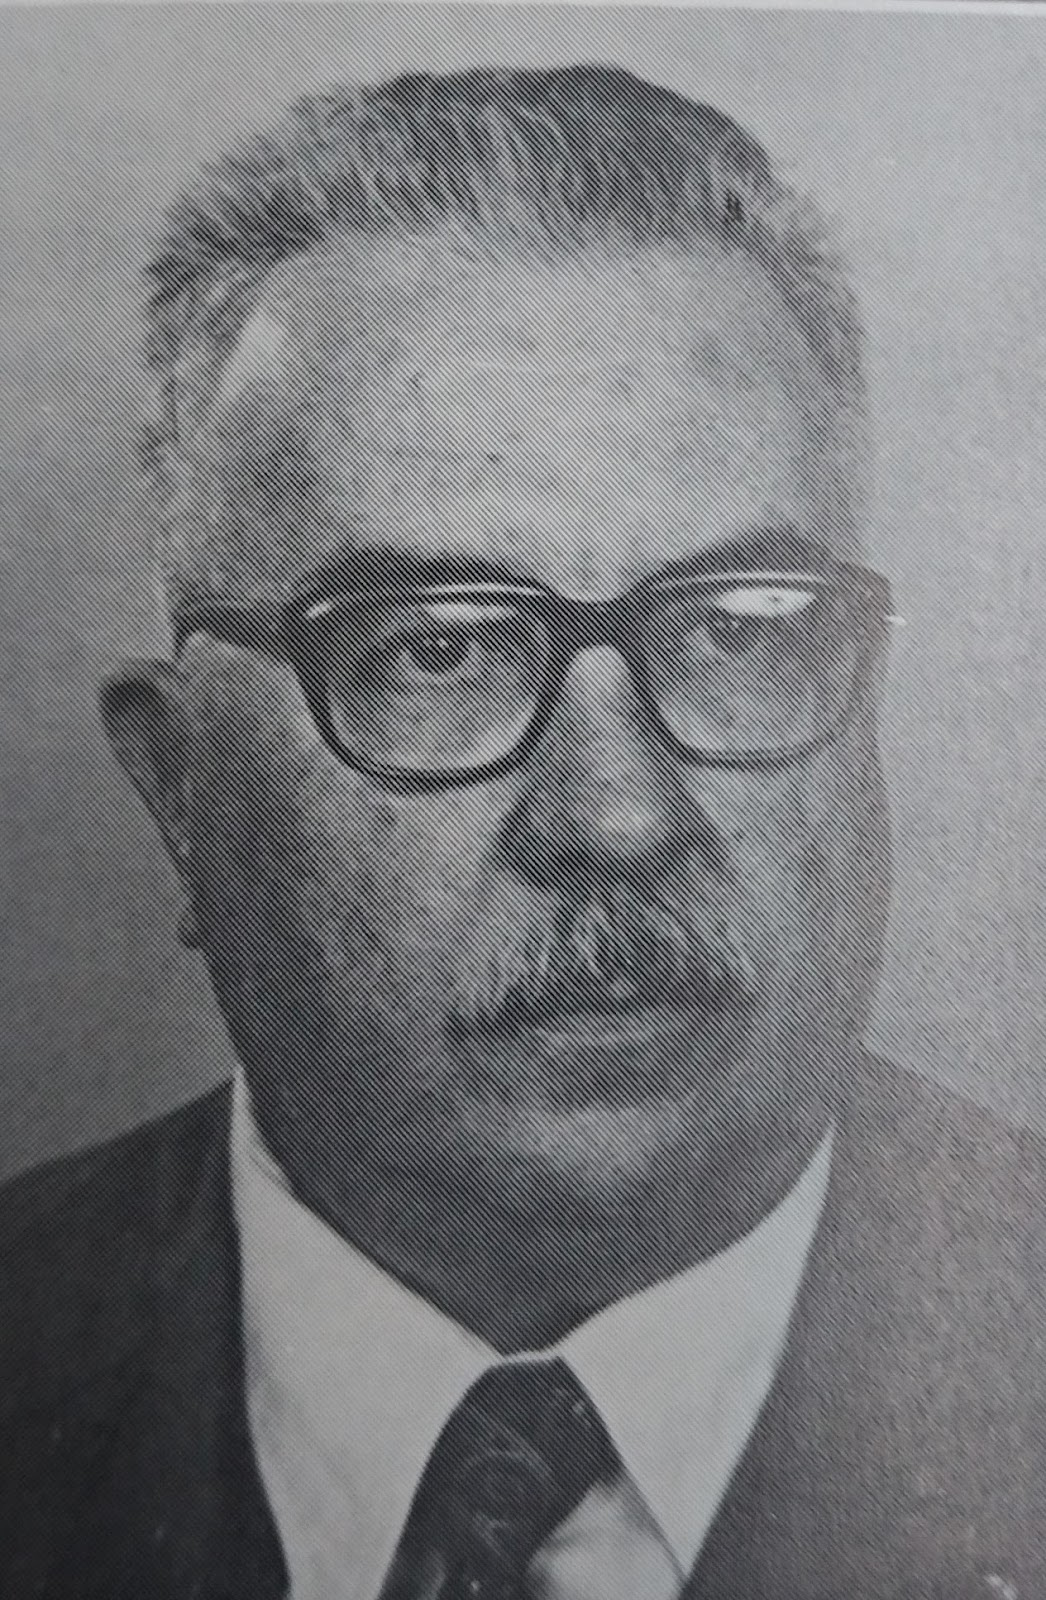 Pioneiro: Helénton Borba Côrtes